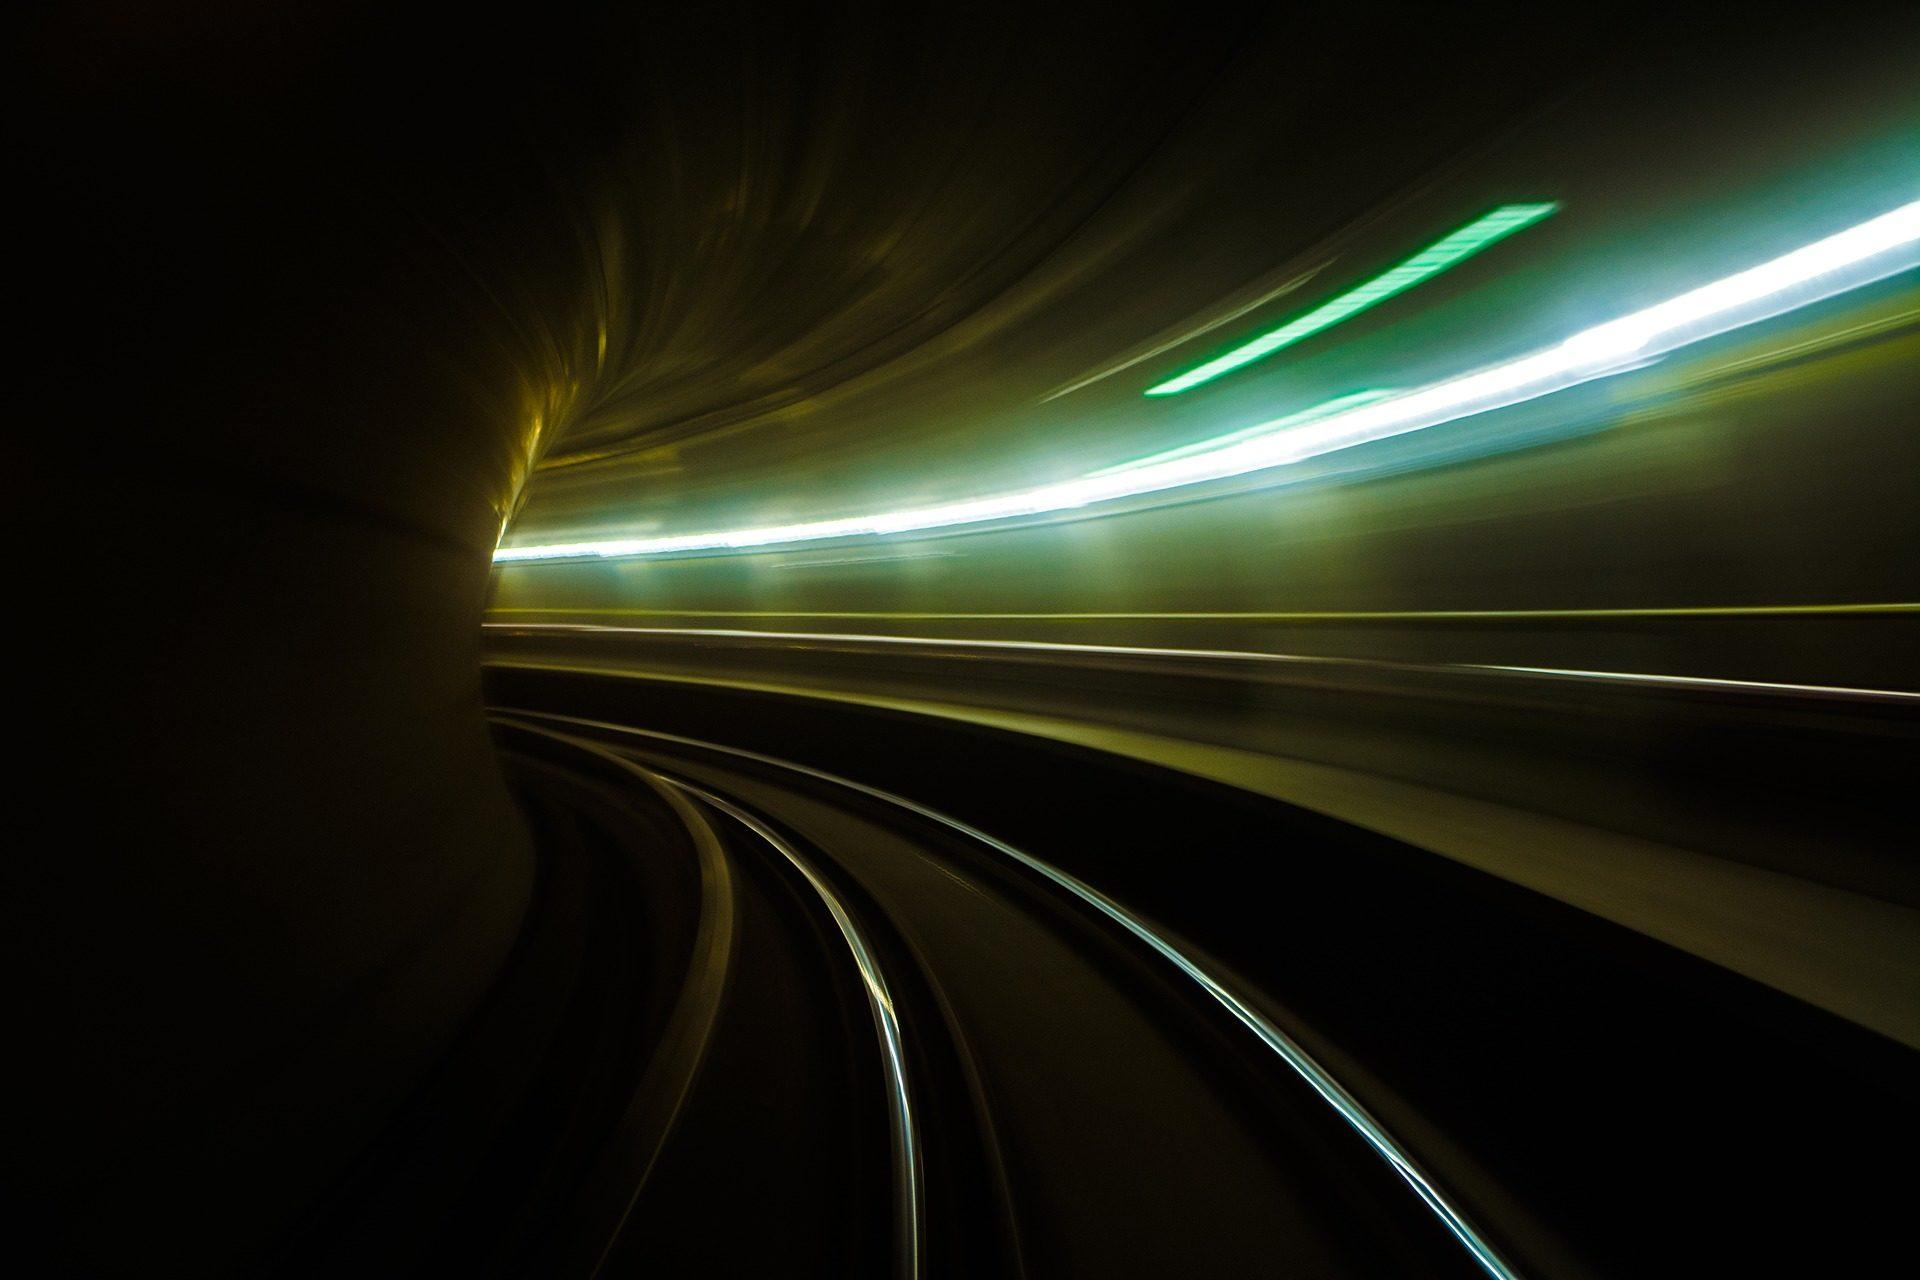 túnel, Metrô, Vía, luzes, velocidade, curva - Papéis de parede HD - Professor-falken.com